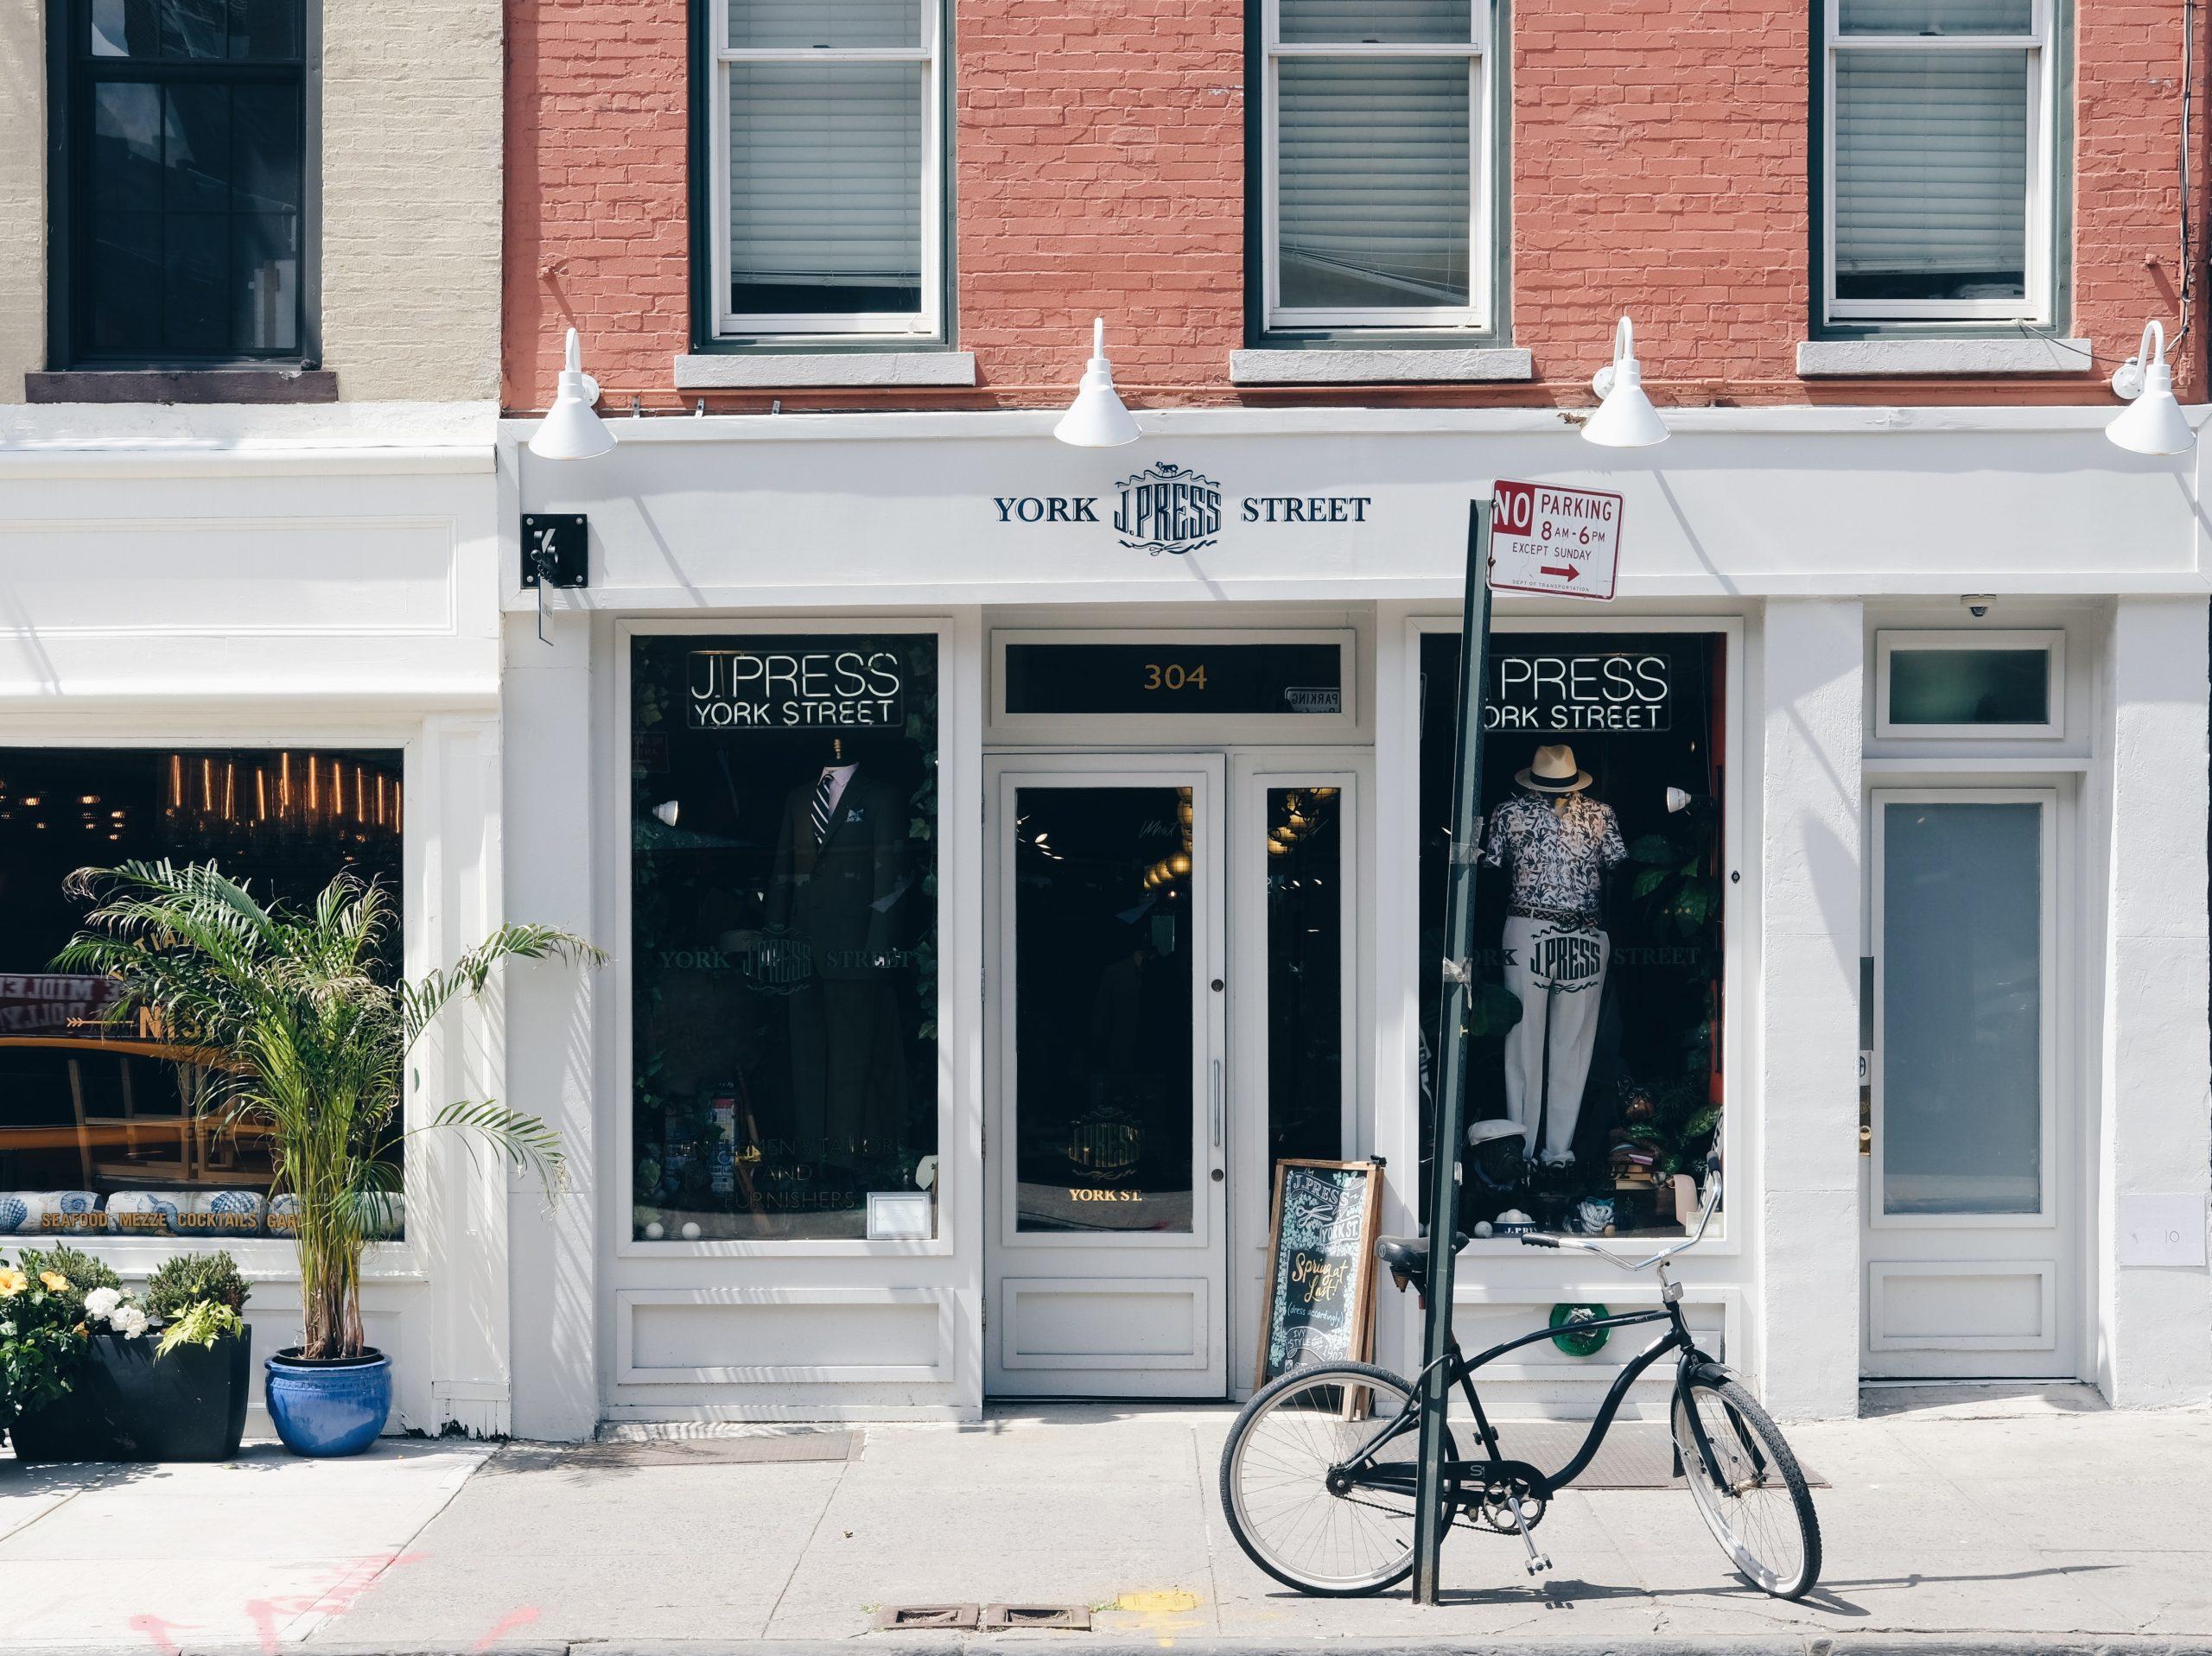 city street - Capstone Digital Marketing